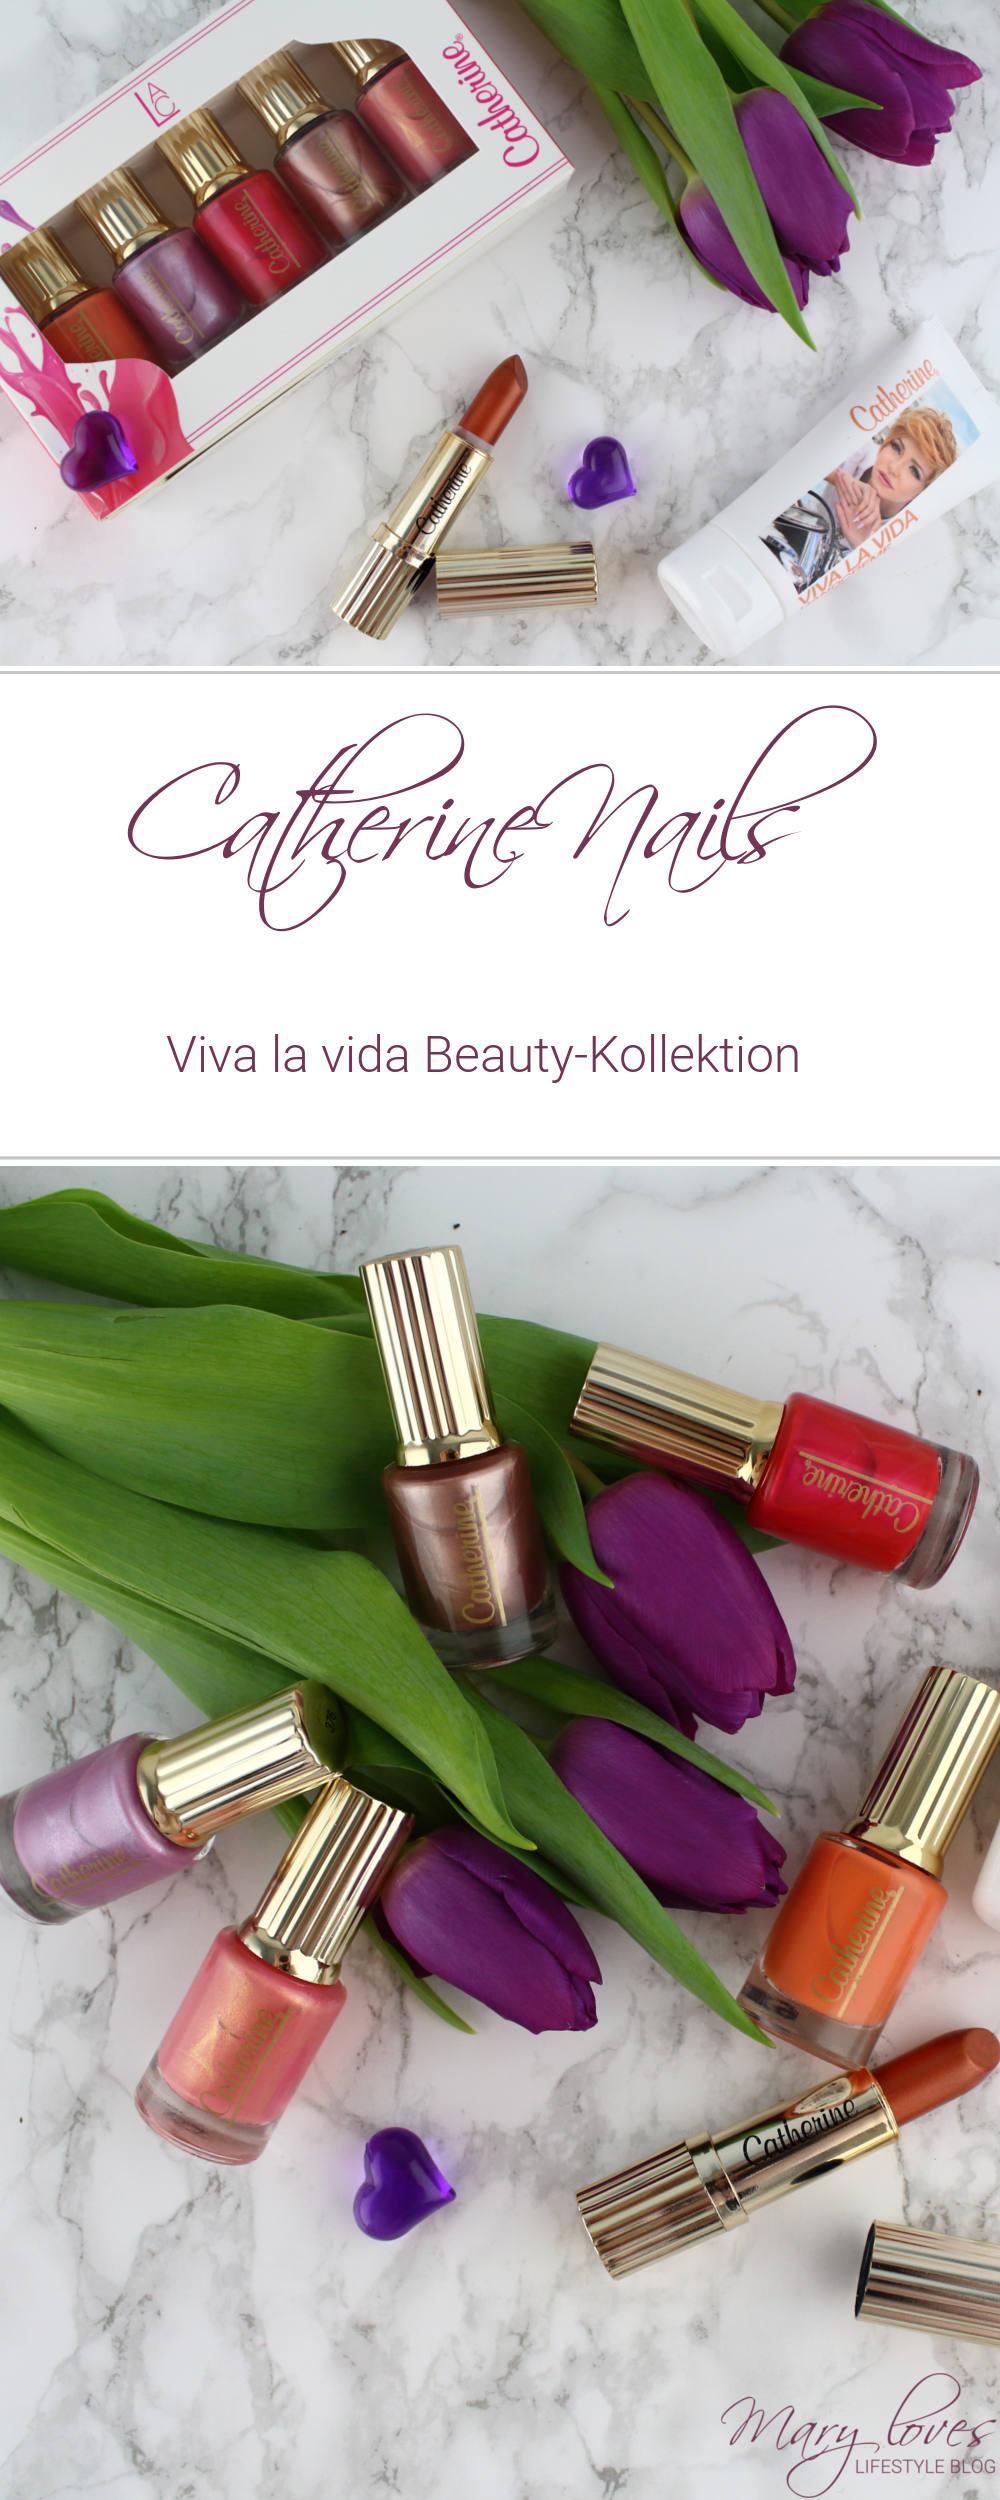 Catherine Viva la vida Beauty-Kollektion - Nagellack - Lippenstift - Nails - Handcreme